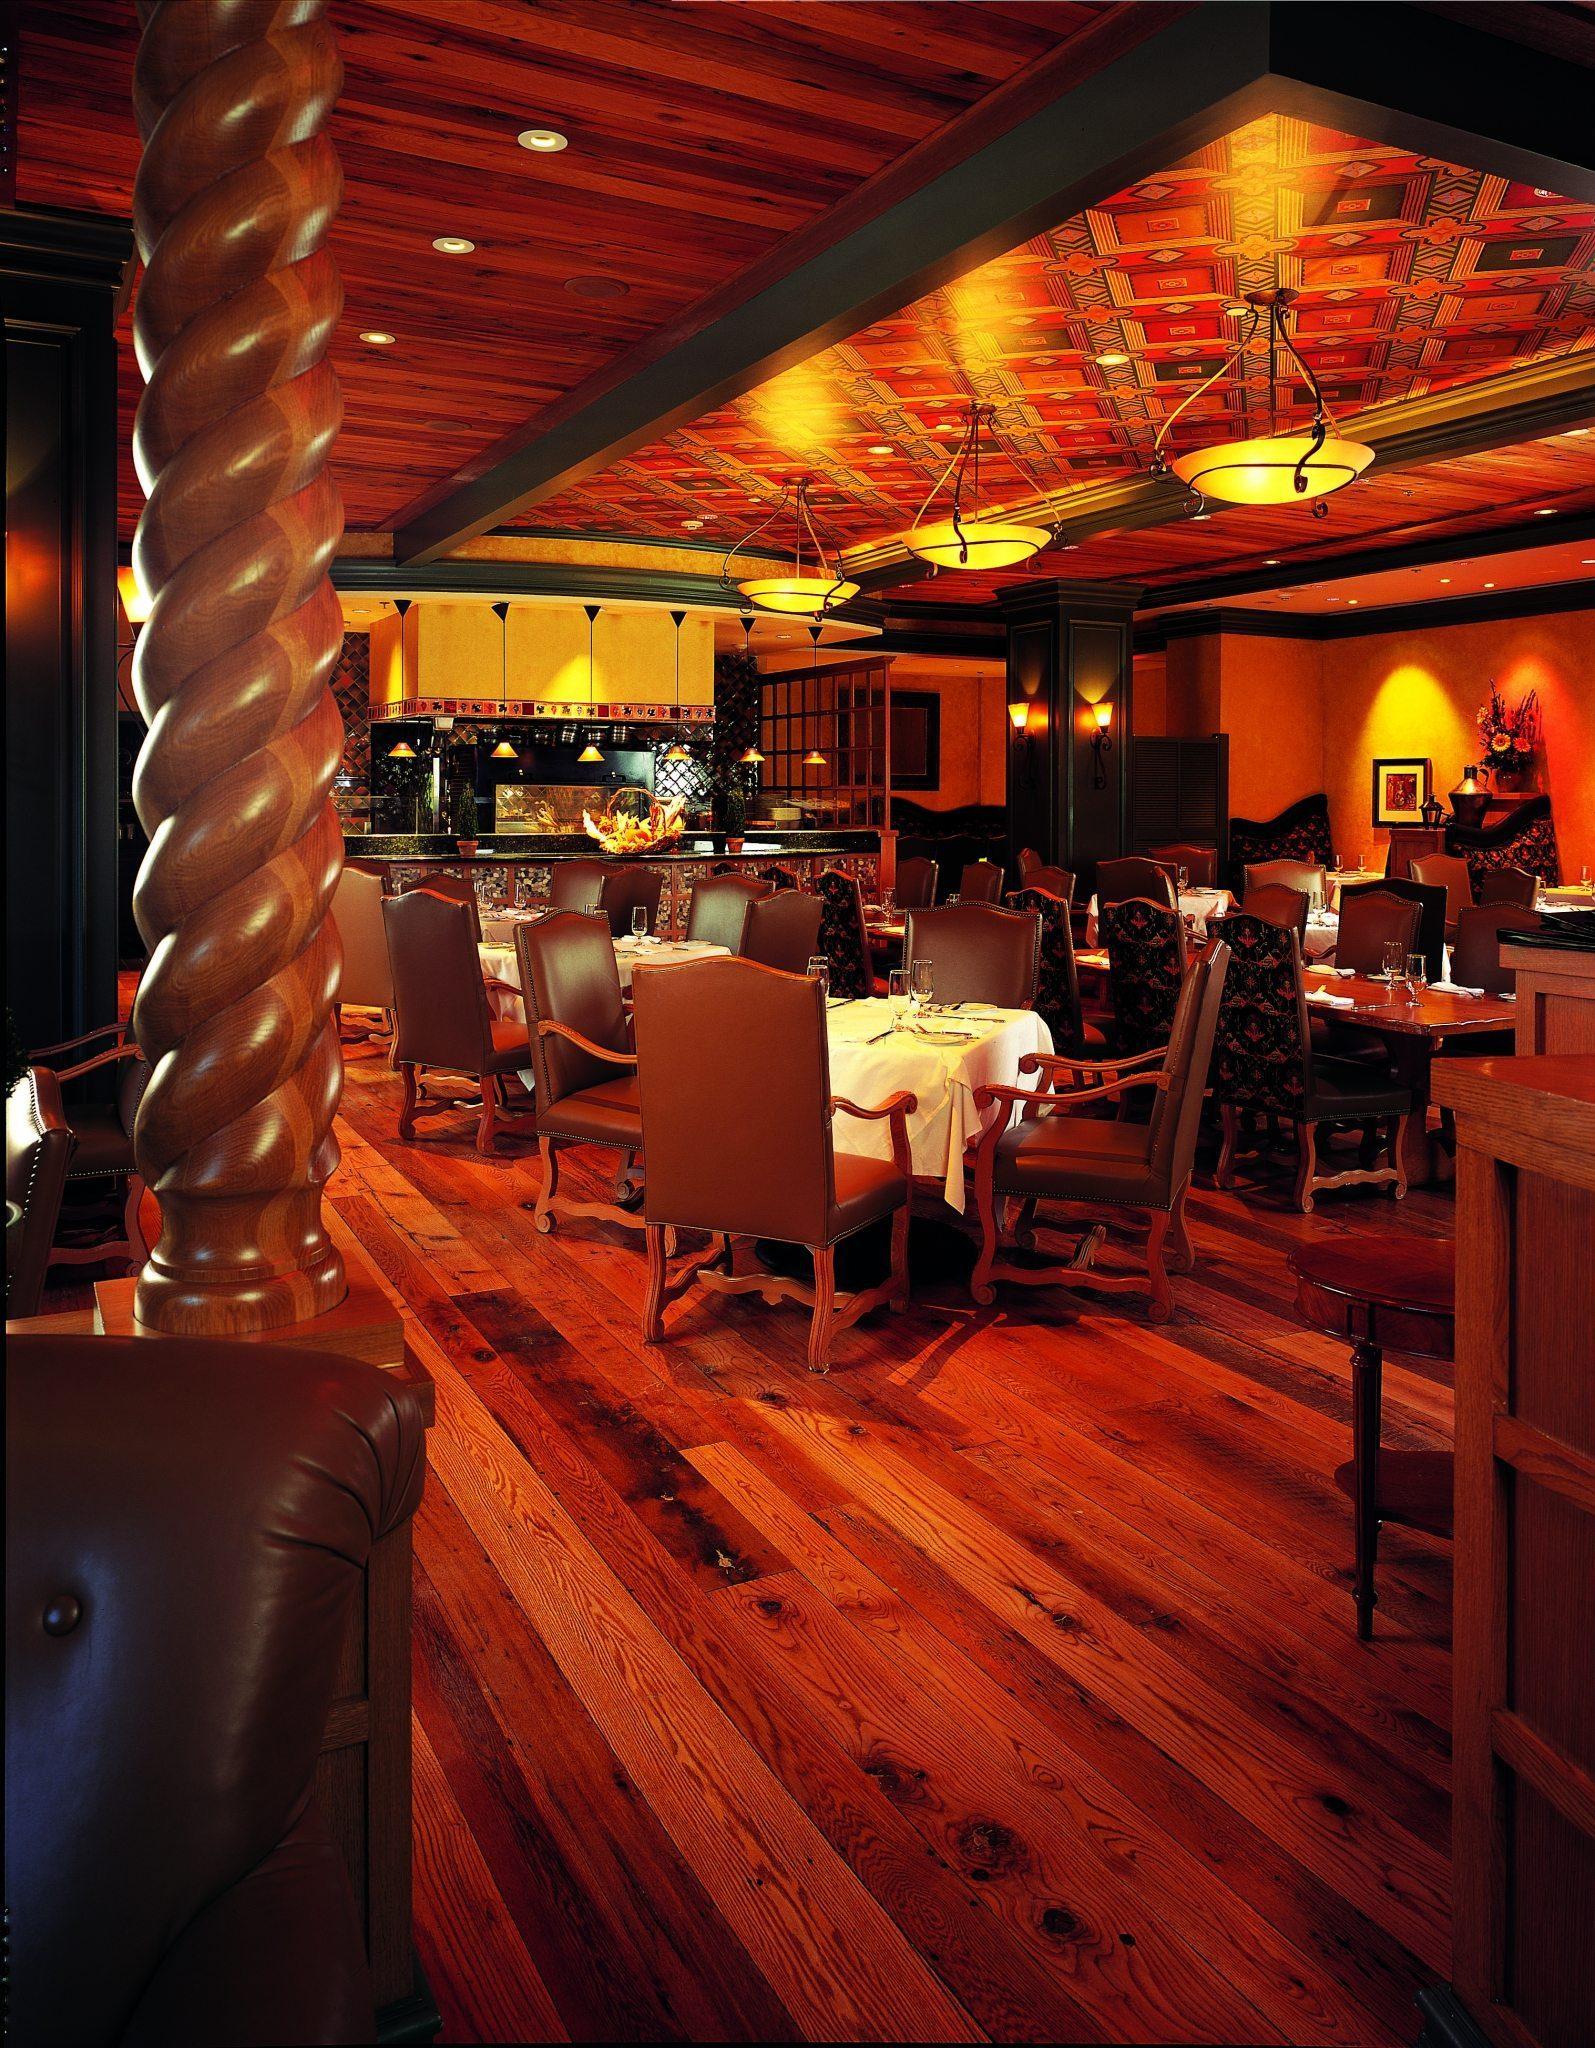 Reclaimed Oak Wood Floors Commercial Dining Room